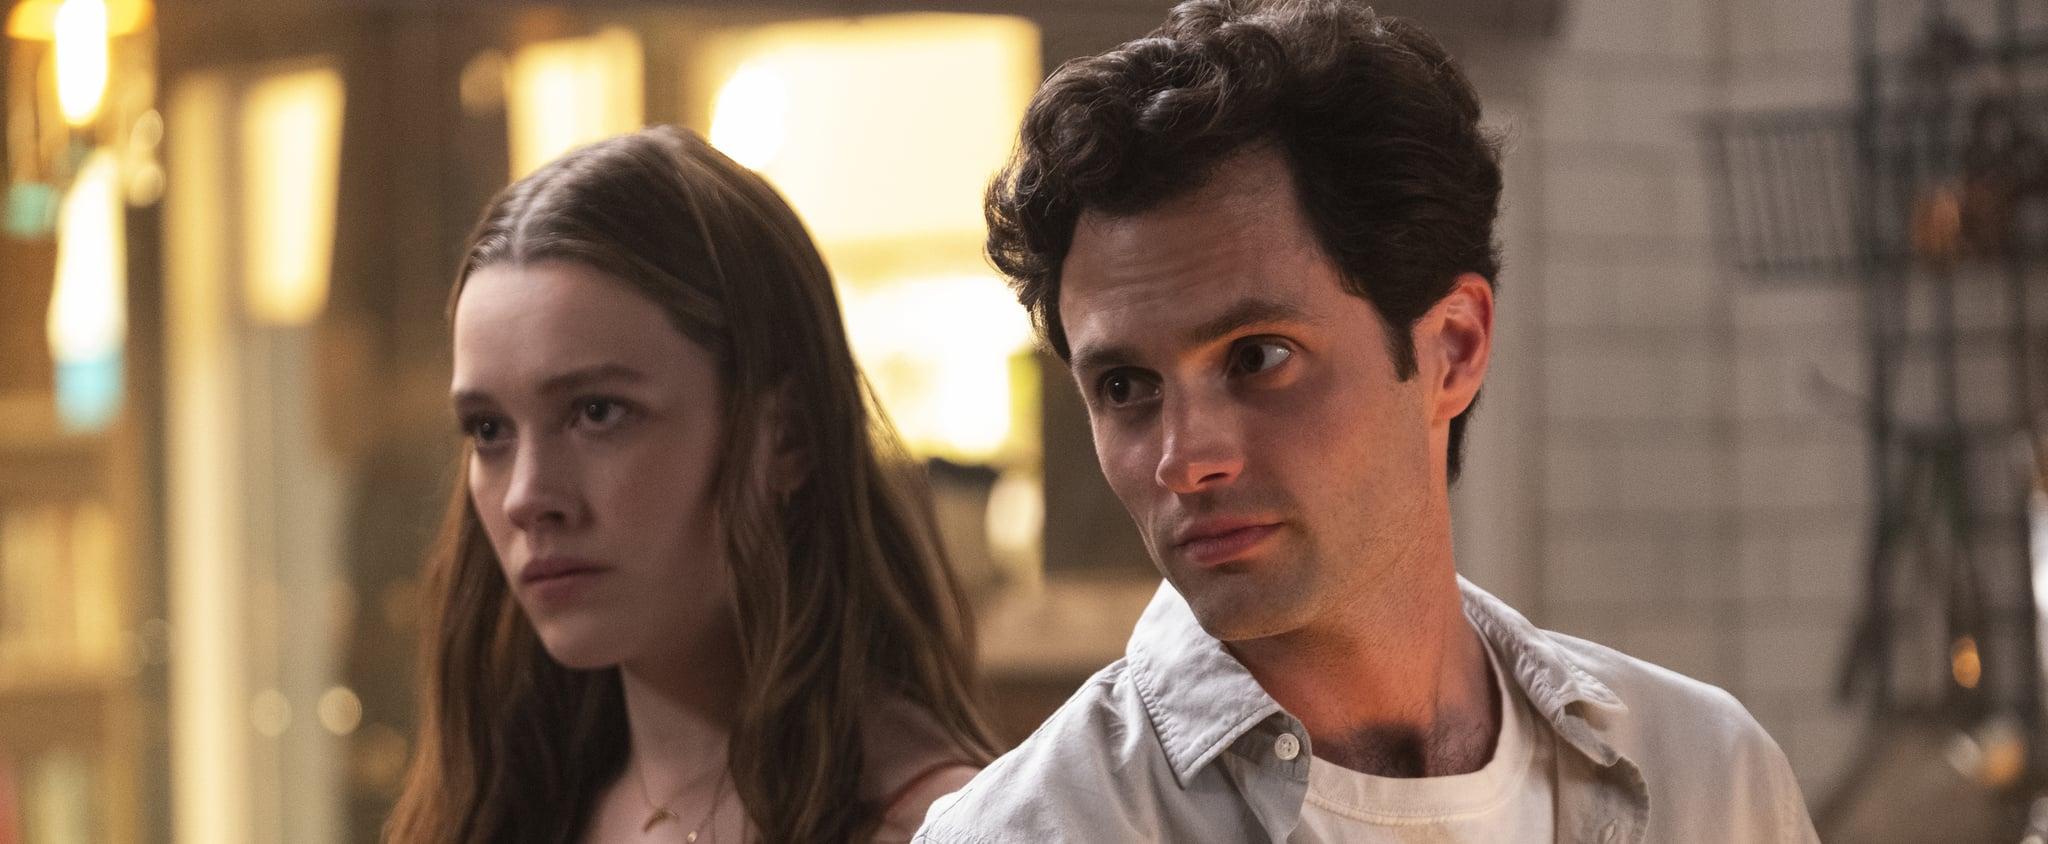 Did Love Kill Her Husband in You Season 2?